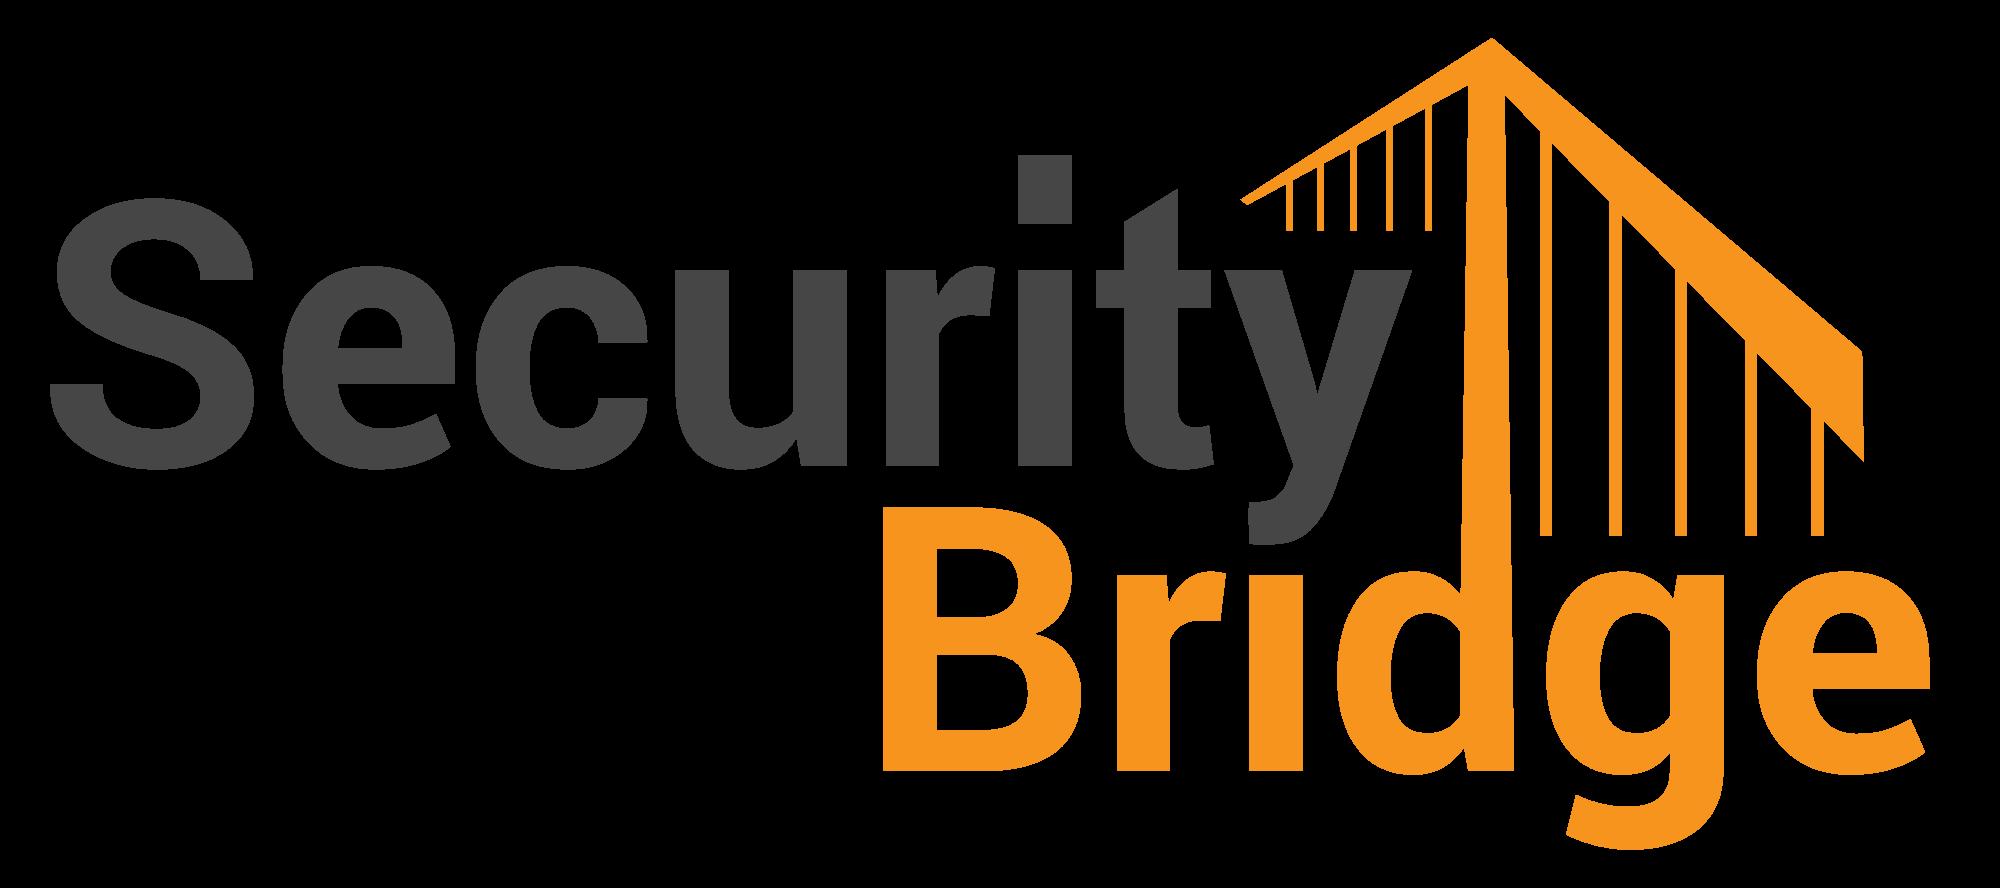 SecurityBridgeLogo-Vector-grey-Sticker